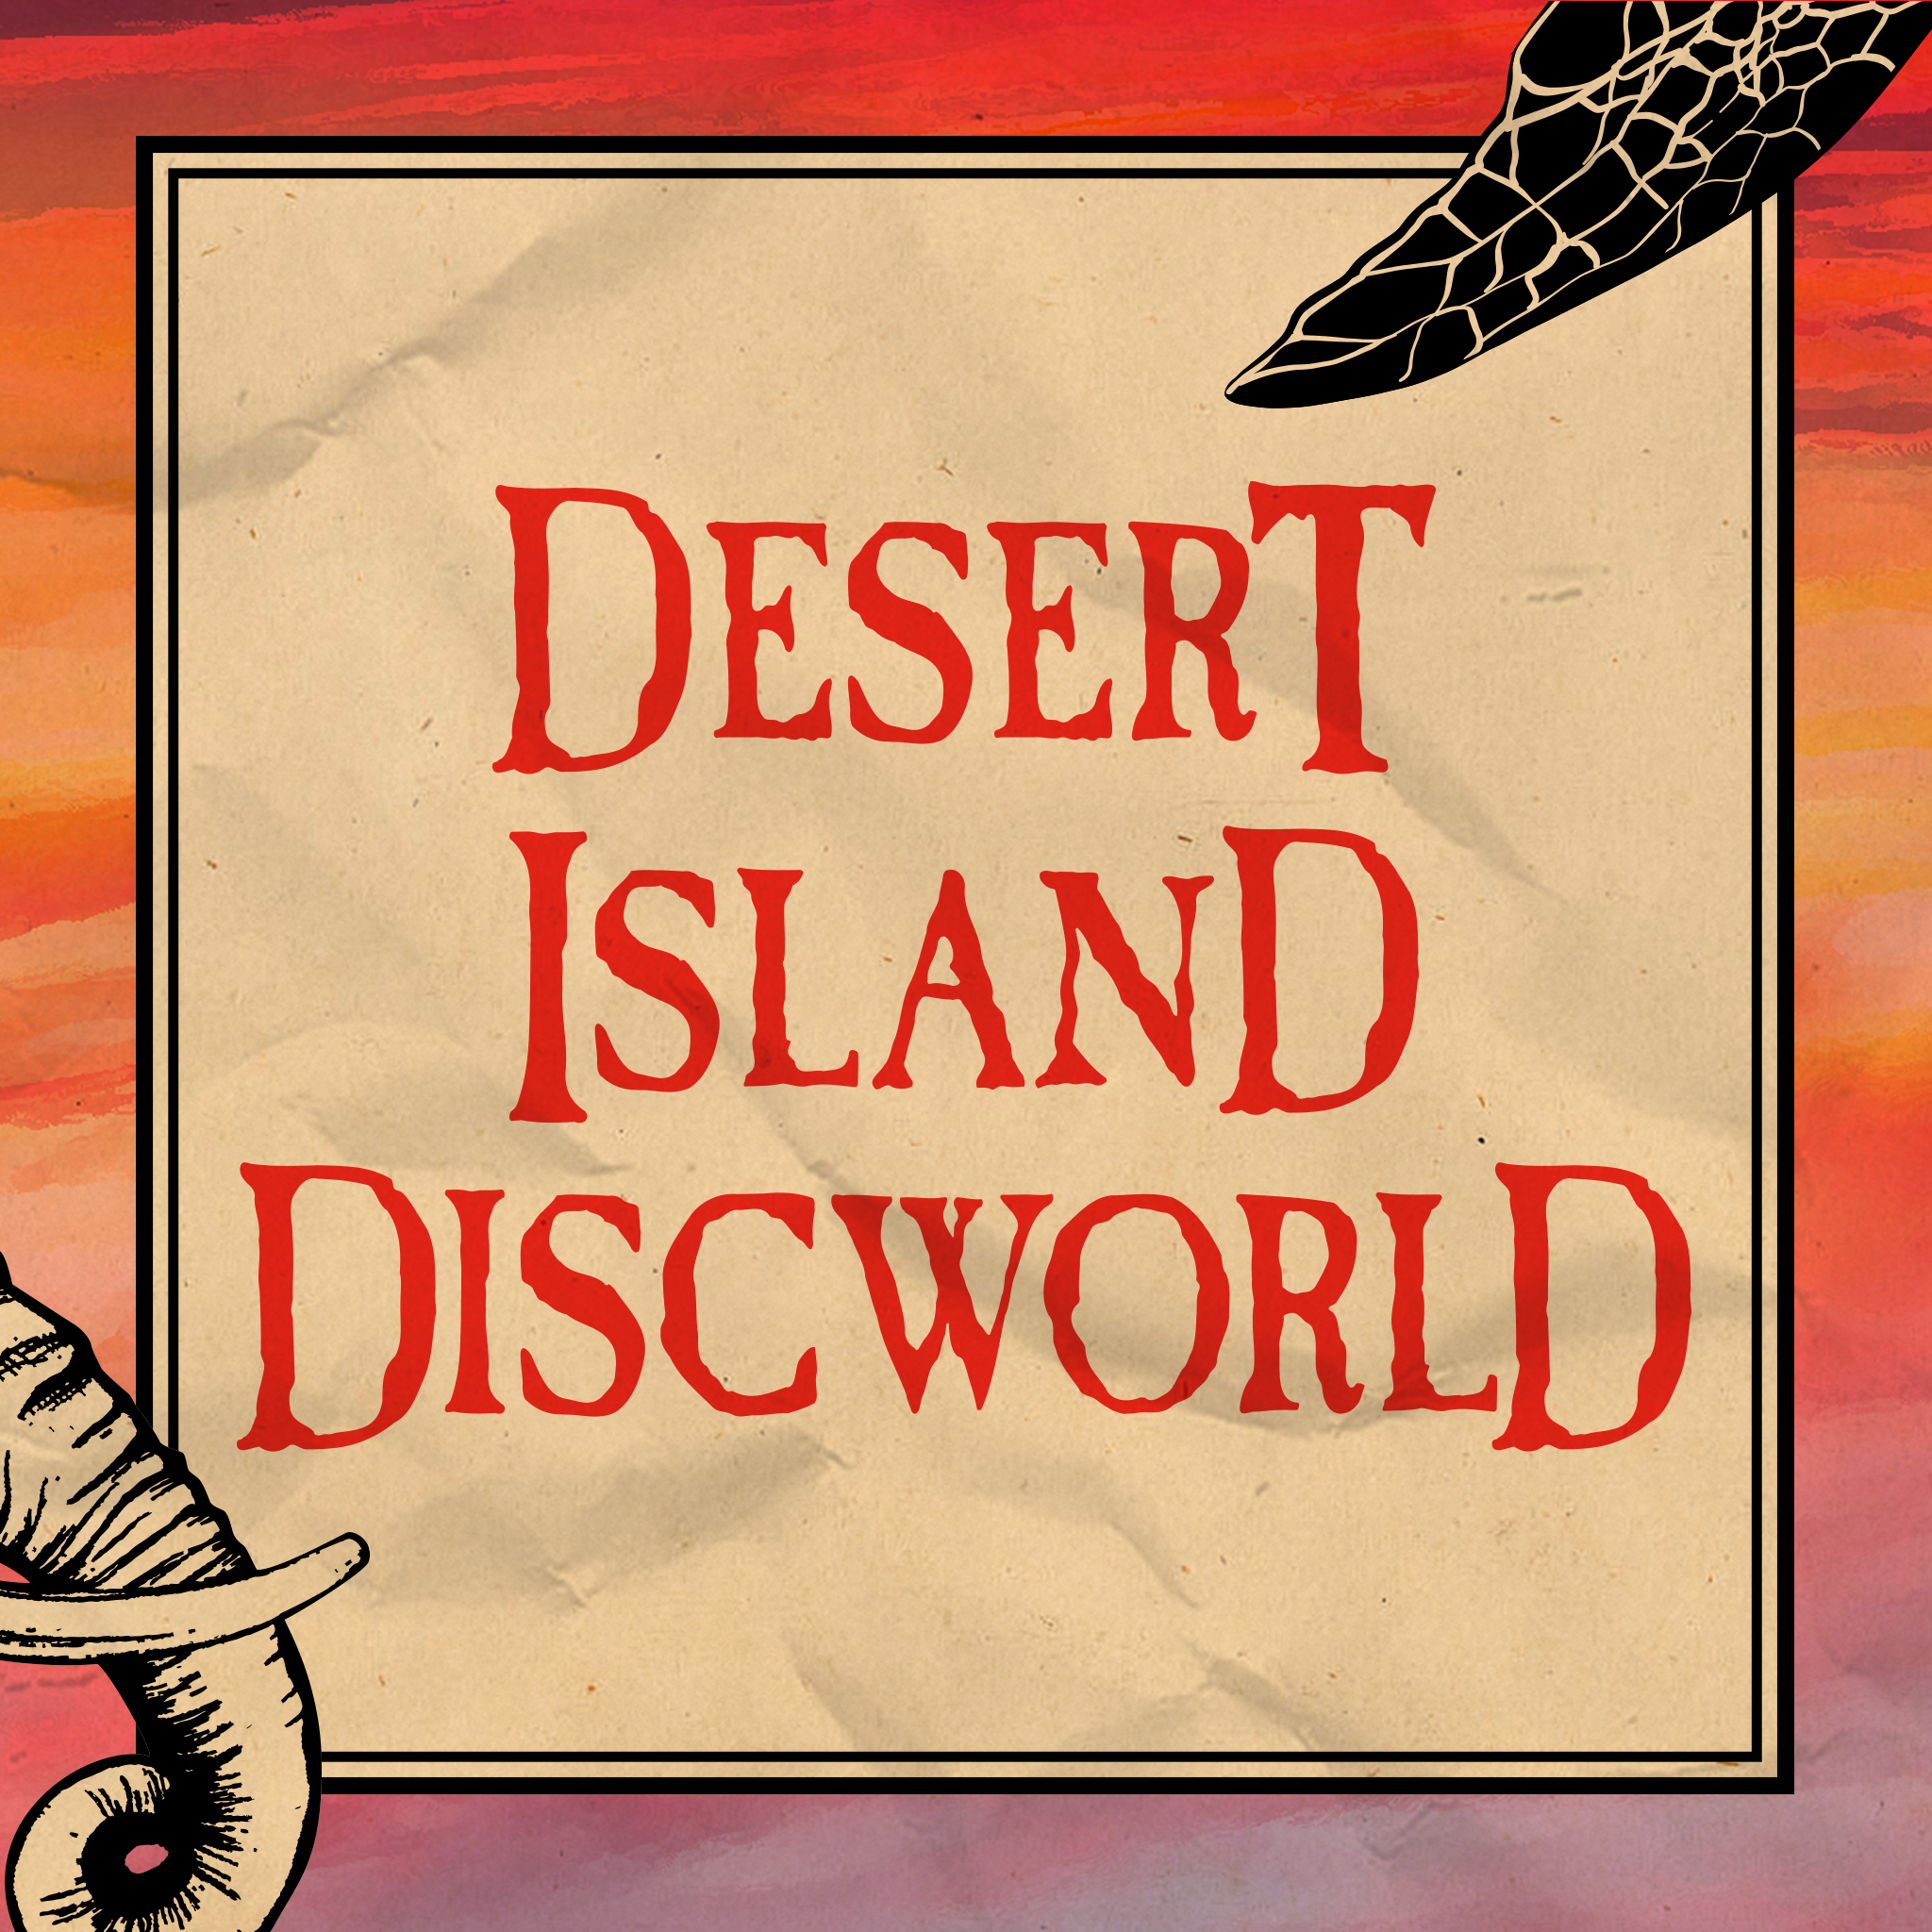 Desert Island Discworld show art